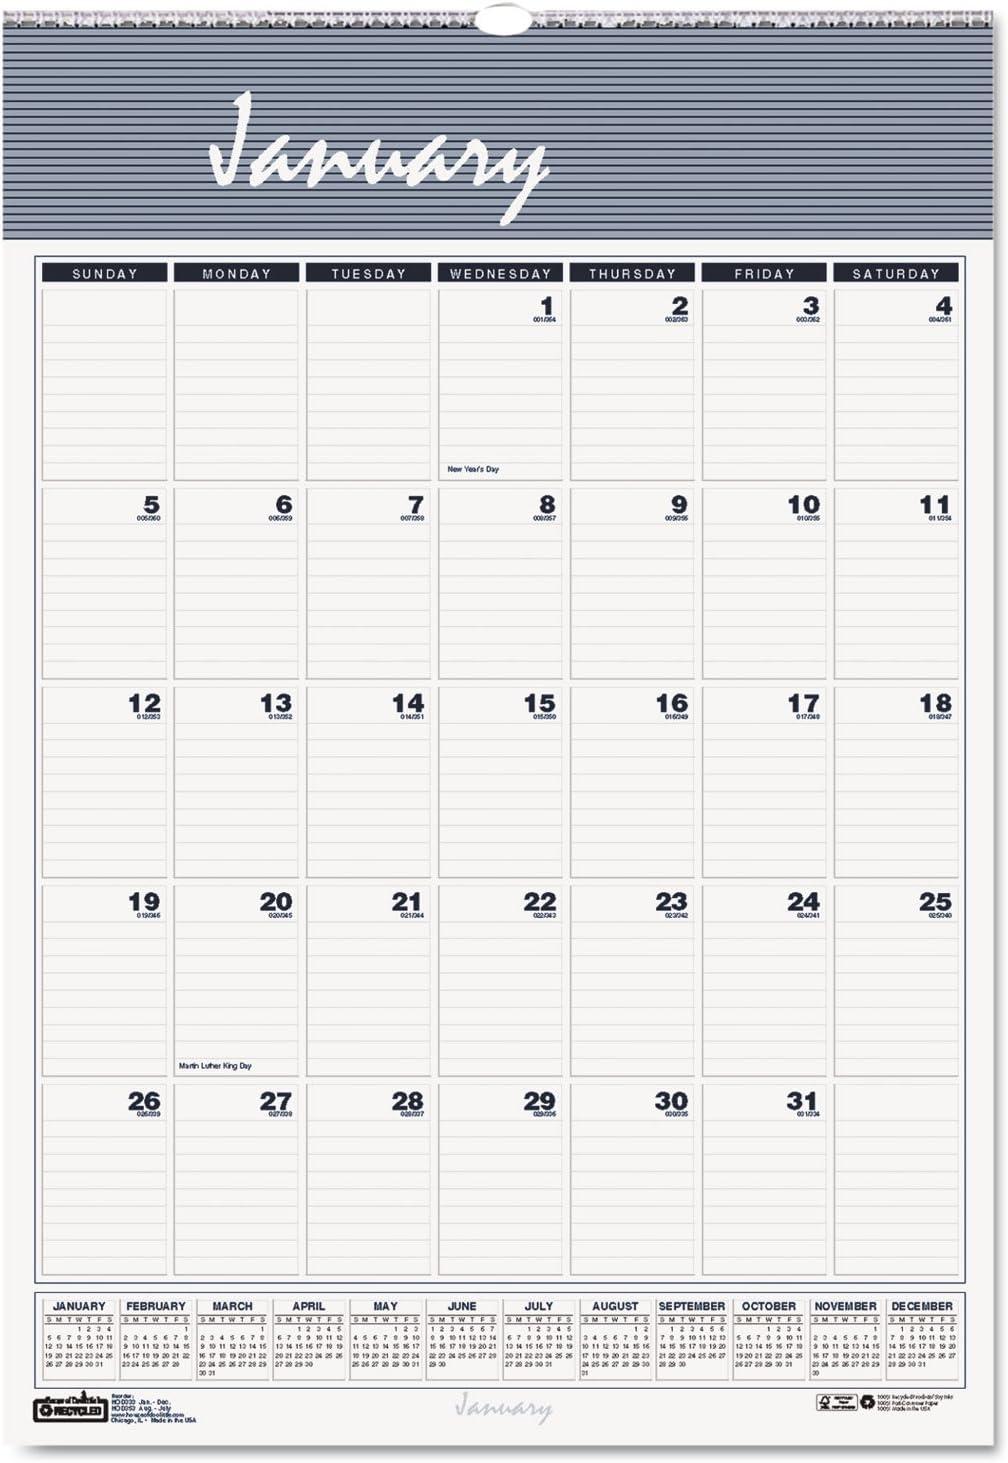 OP HOD331HD United STATIONERS Calendar,Wall,MLY,8.5X11